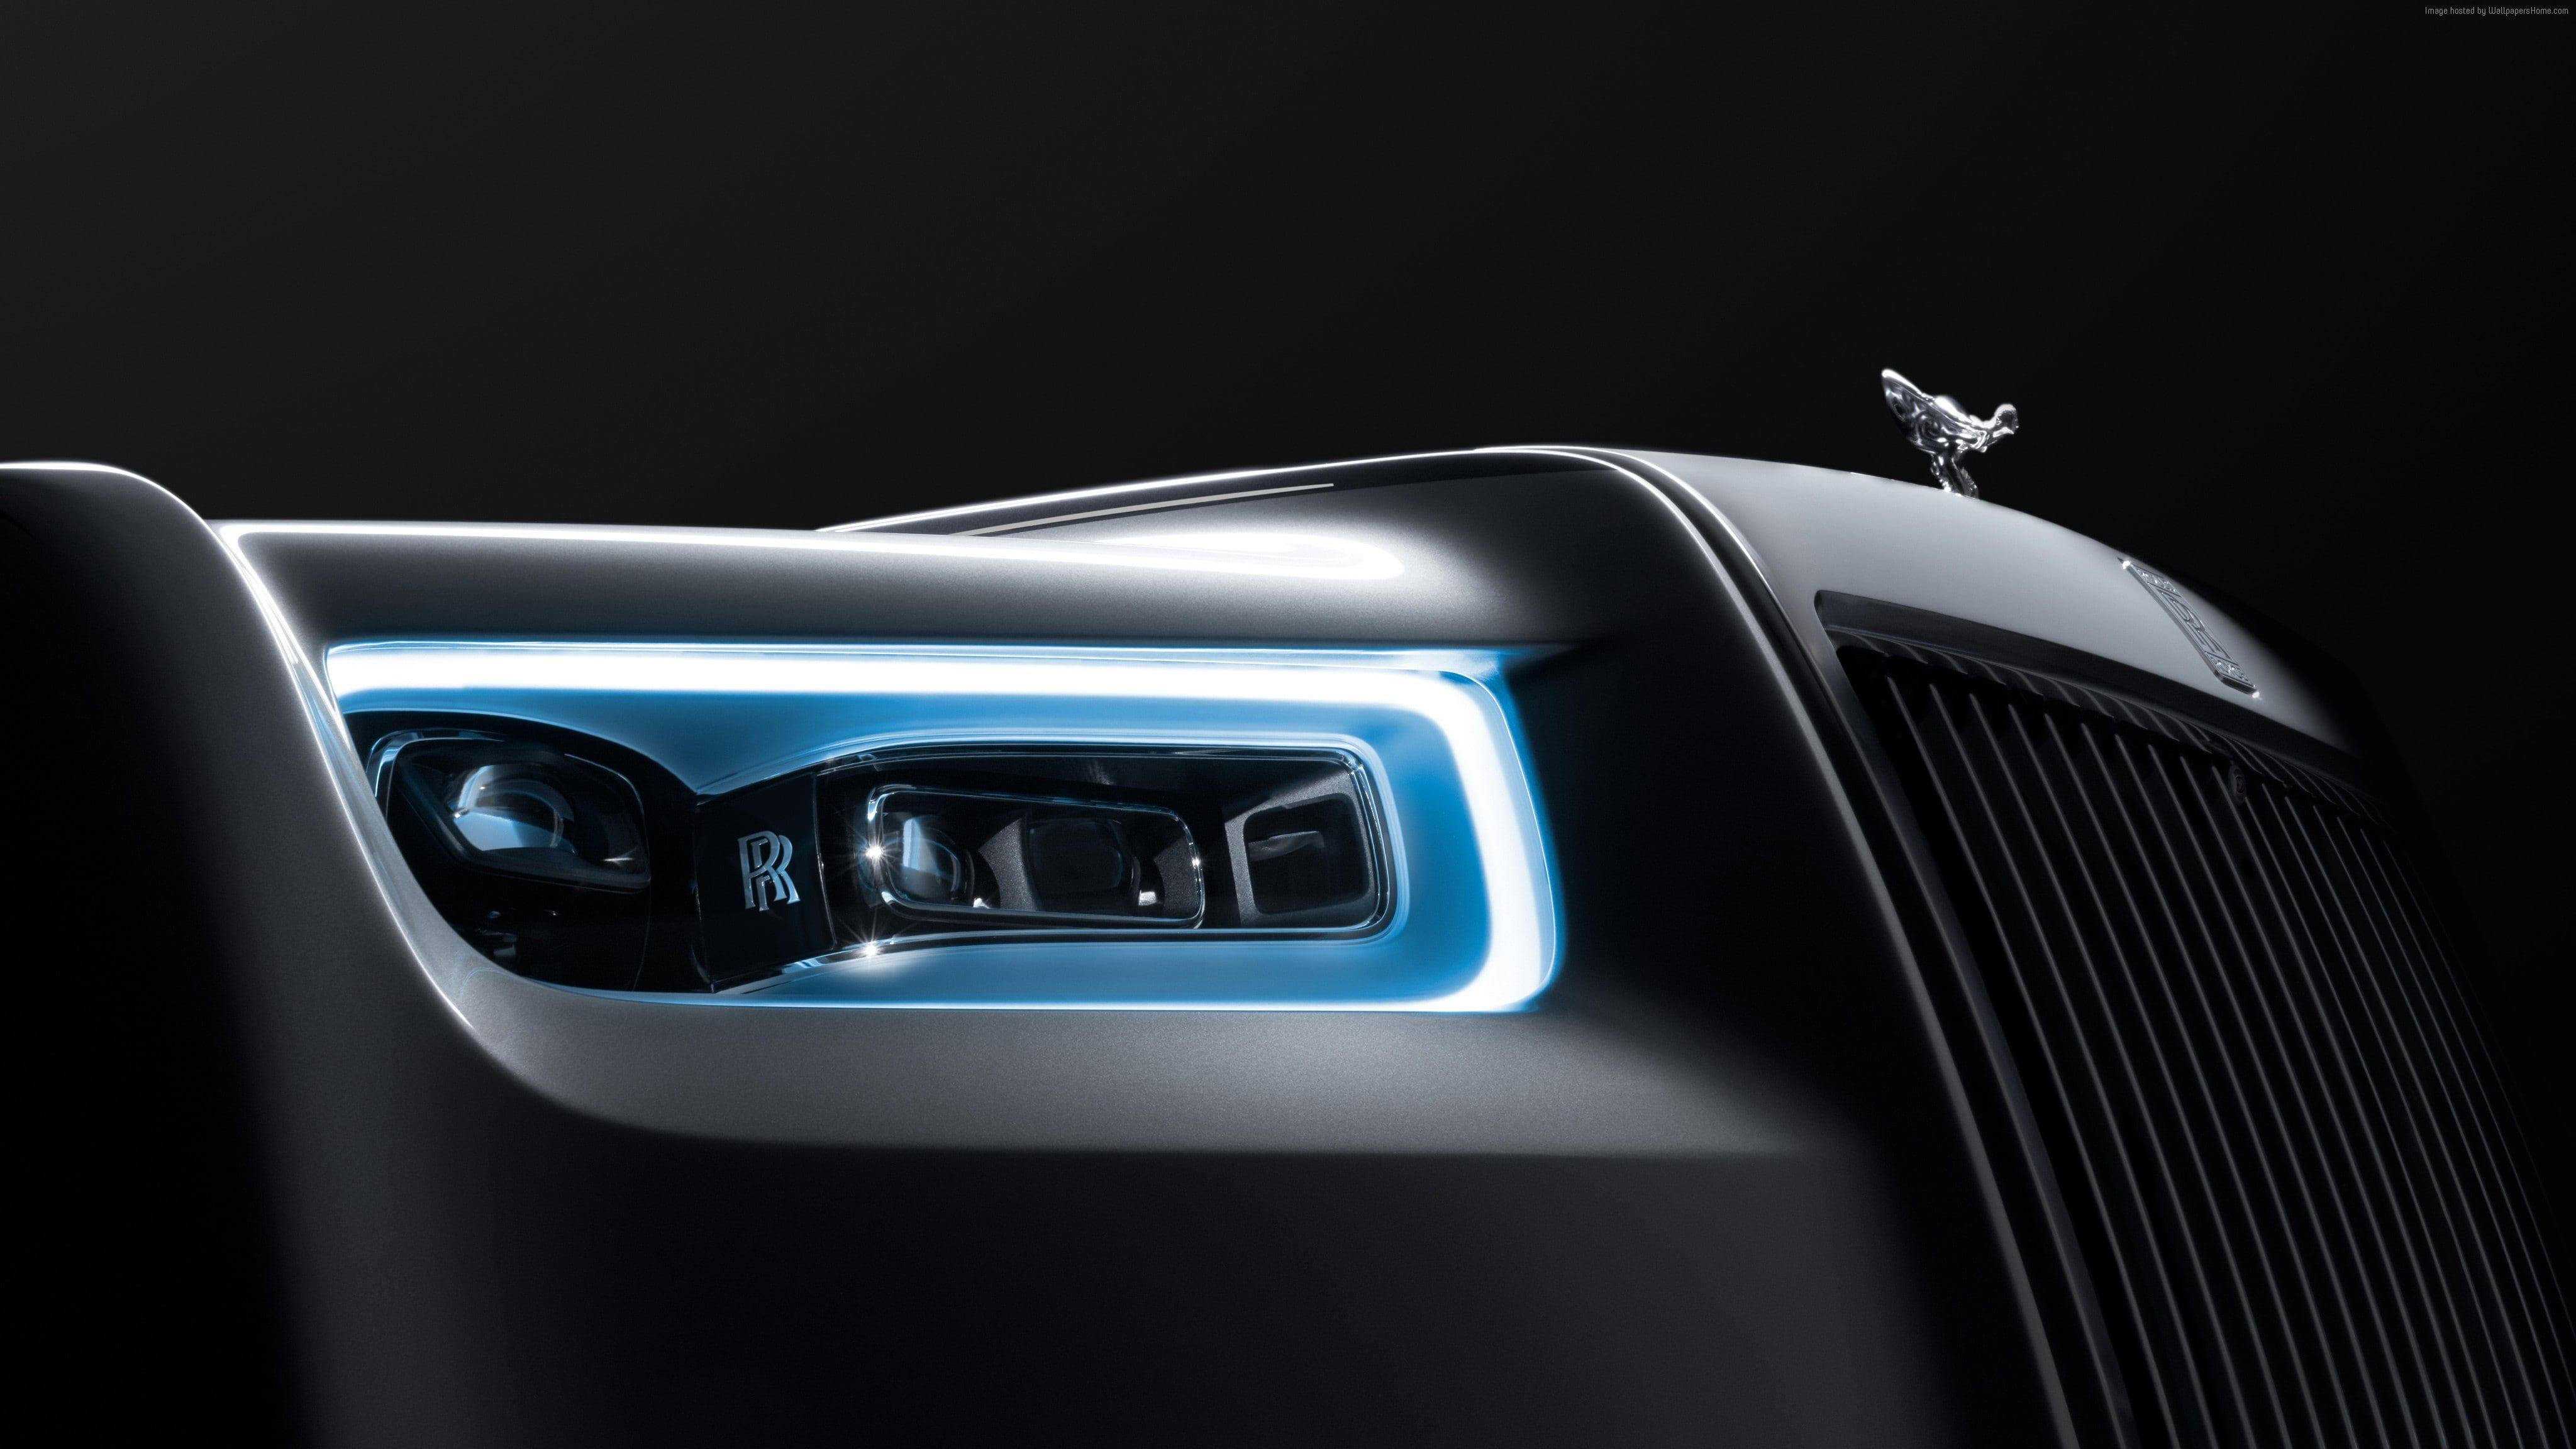 Rolls Royce Phantom 4k Cars 2017 4k Wallpaper Hdwallpaper Desktop Rolls Royce Logo Rolls Royce Phantom Rolls Royce Wallpaper